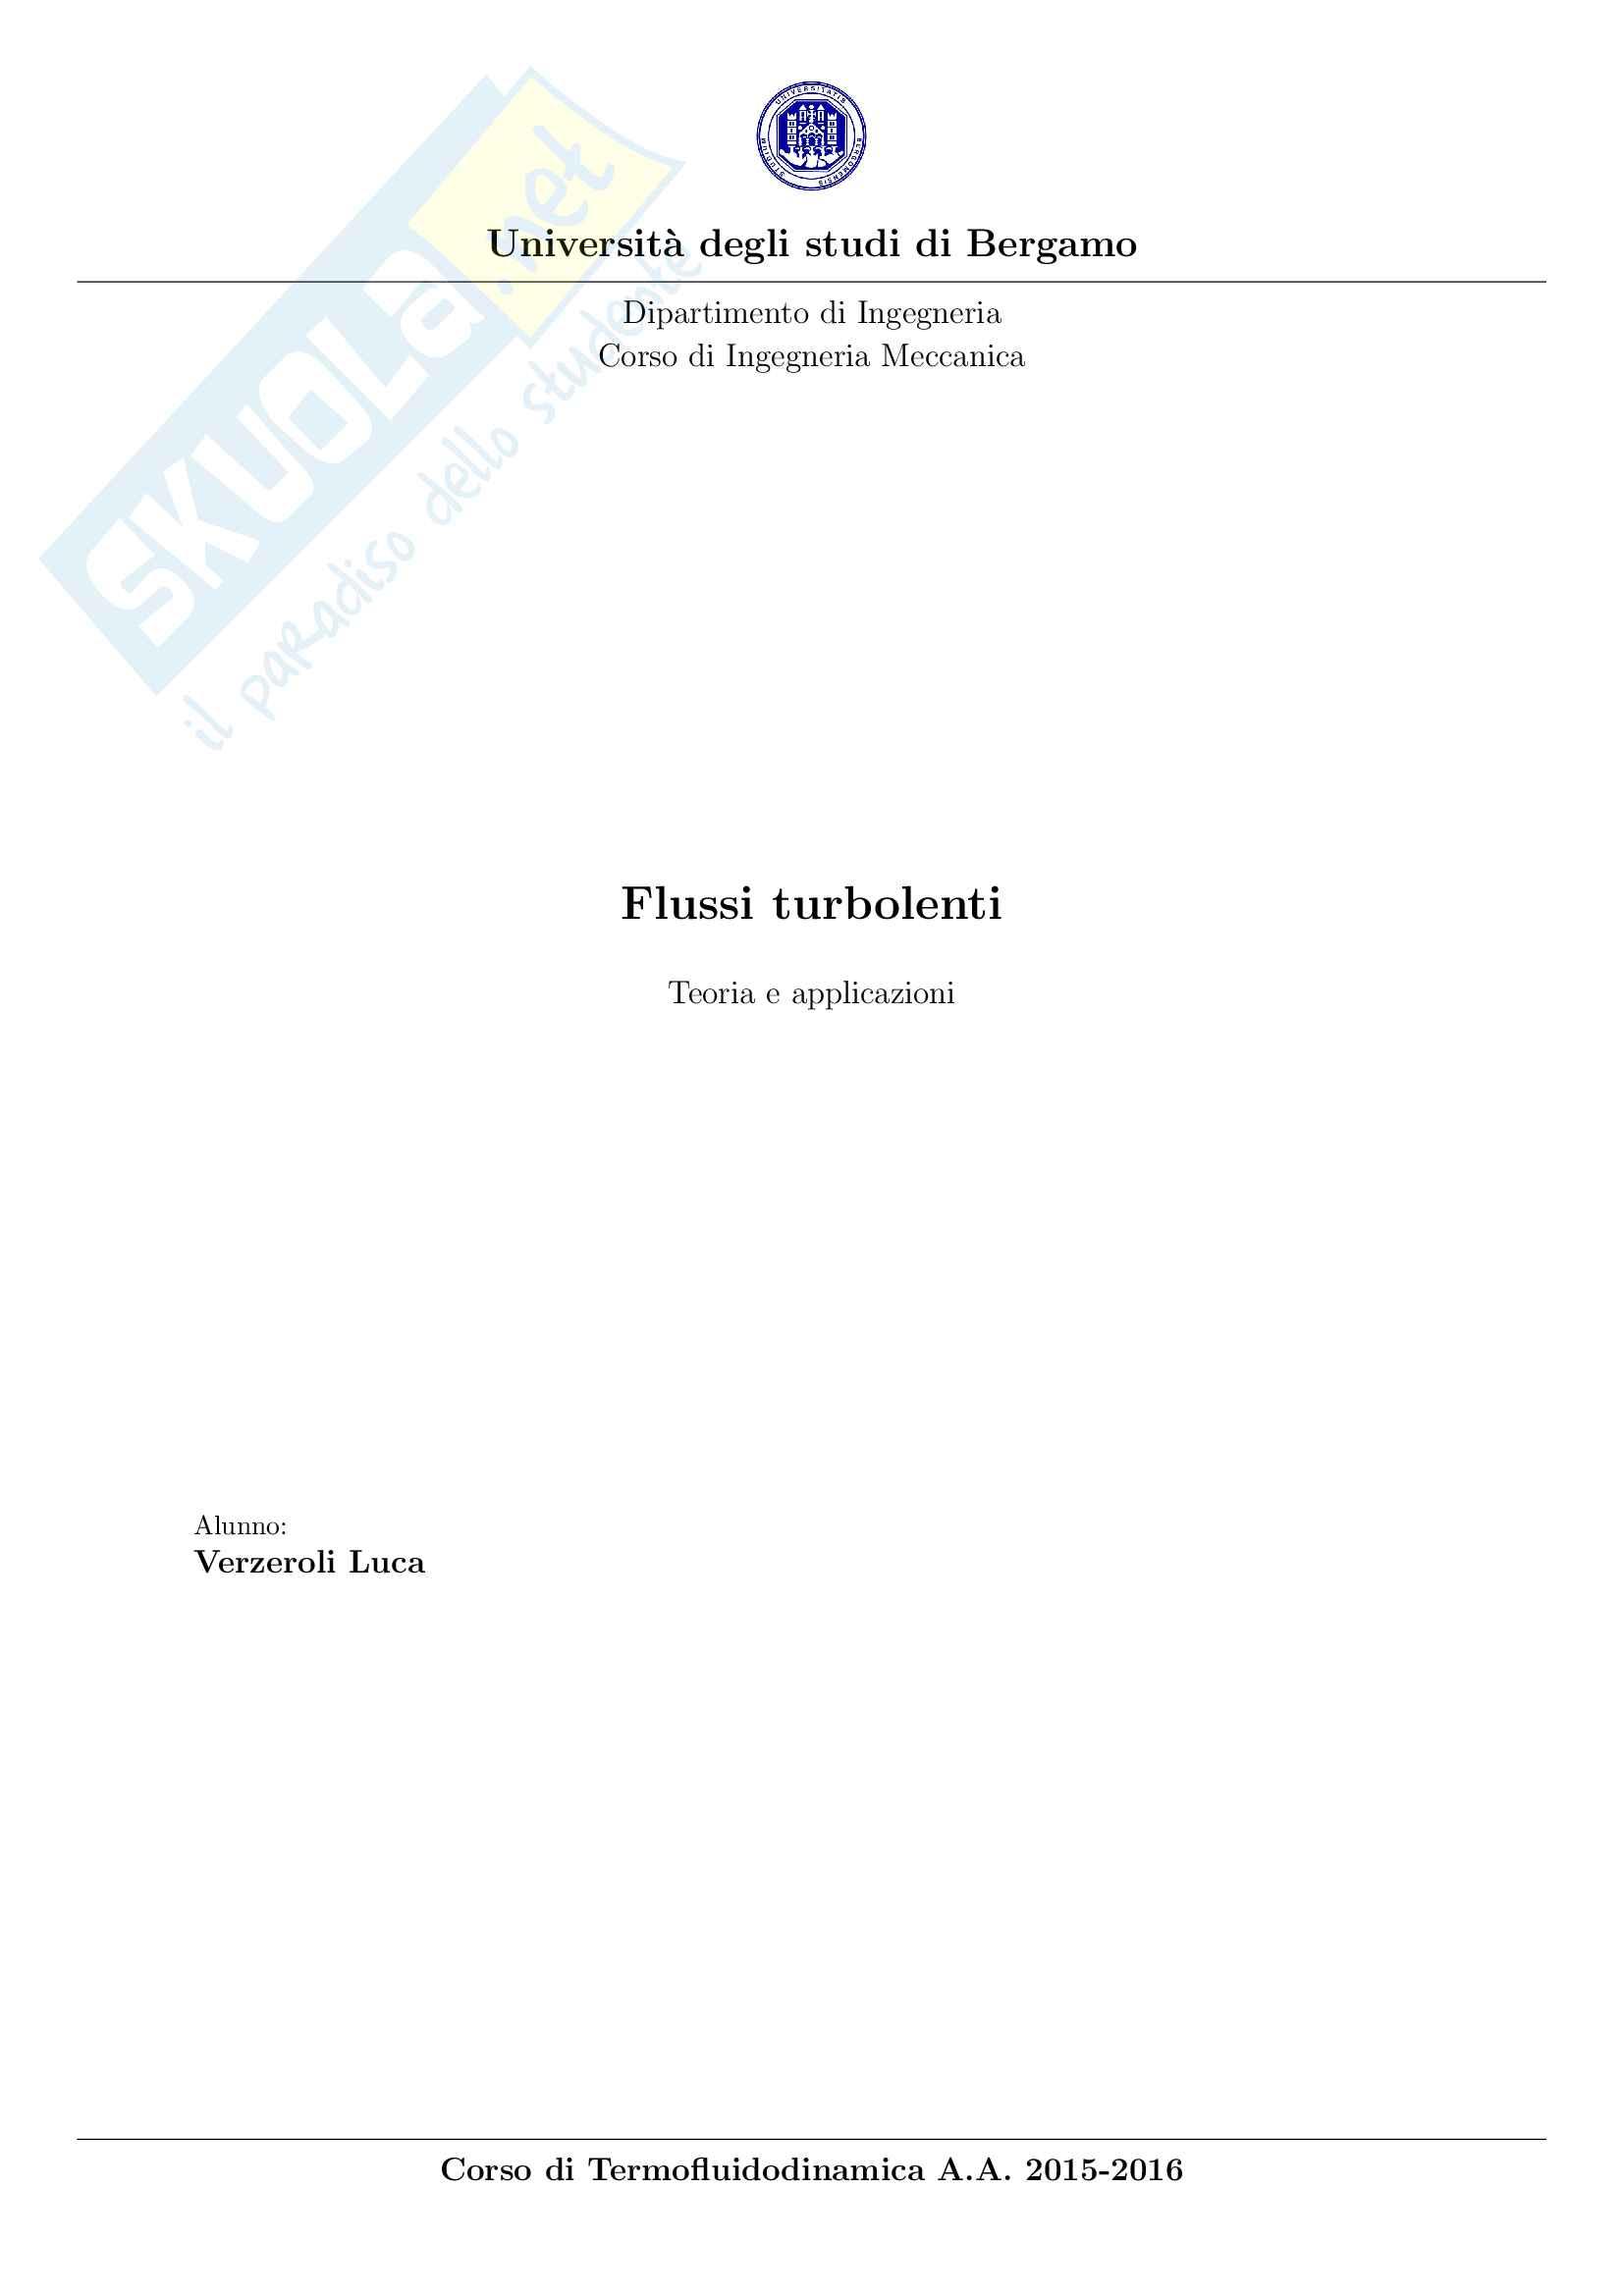 Flussi turbolenti Pag. 1